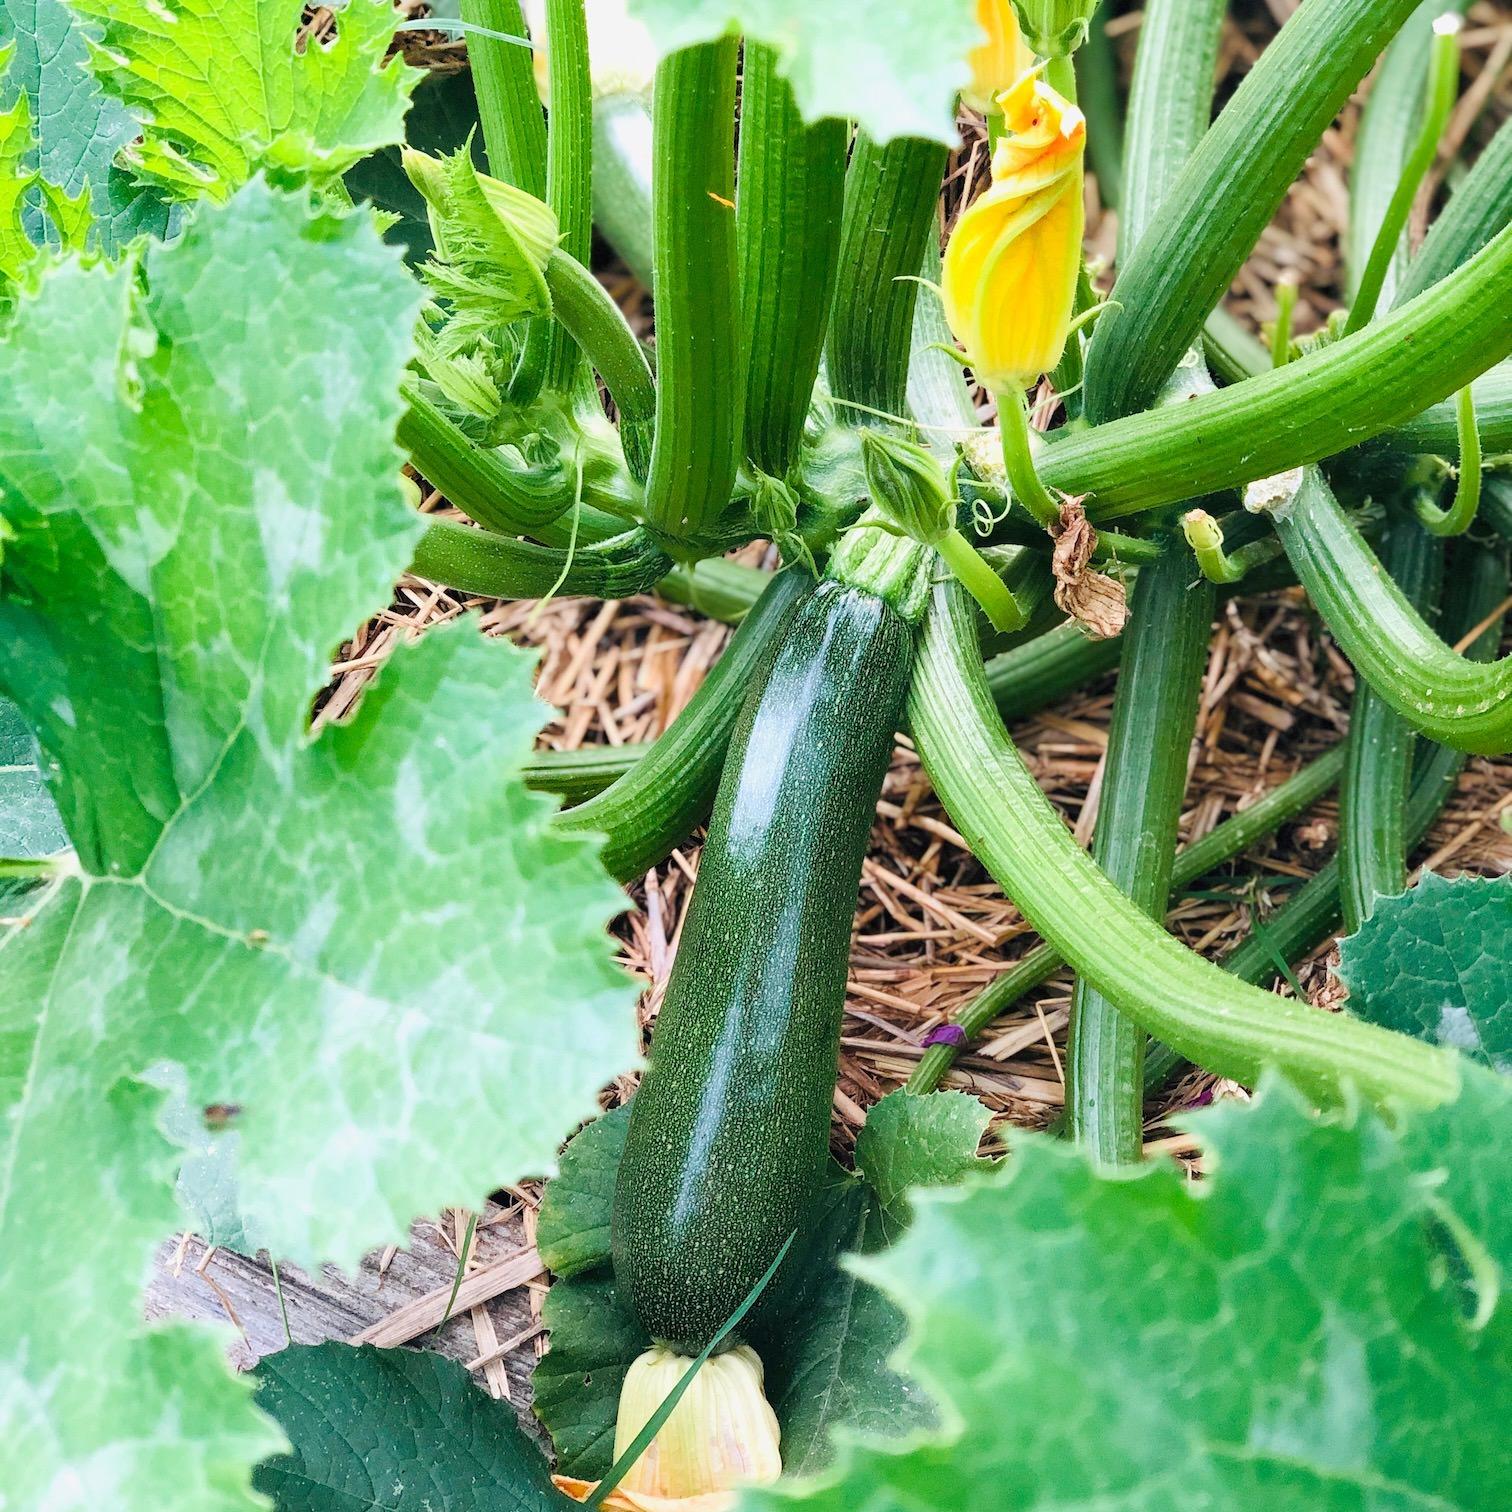 plant-courgette-permaculture-paillage-dame-bio_